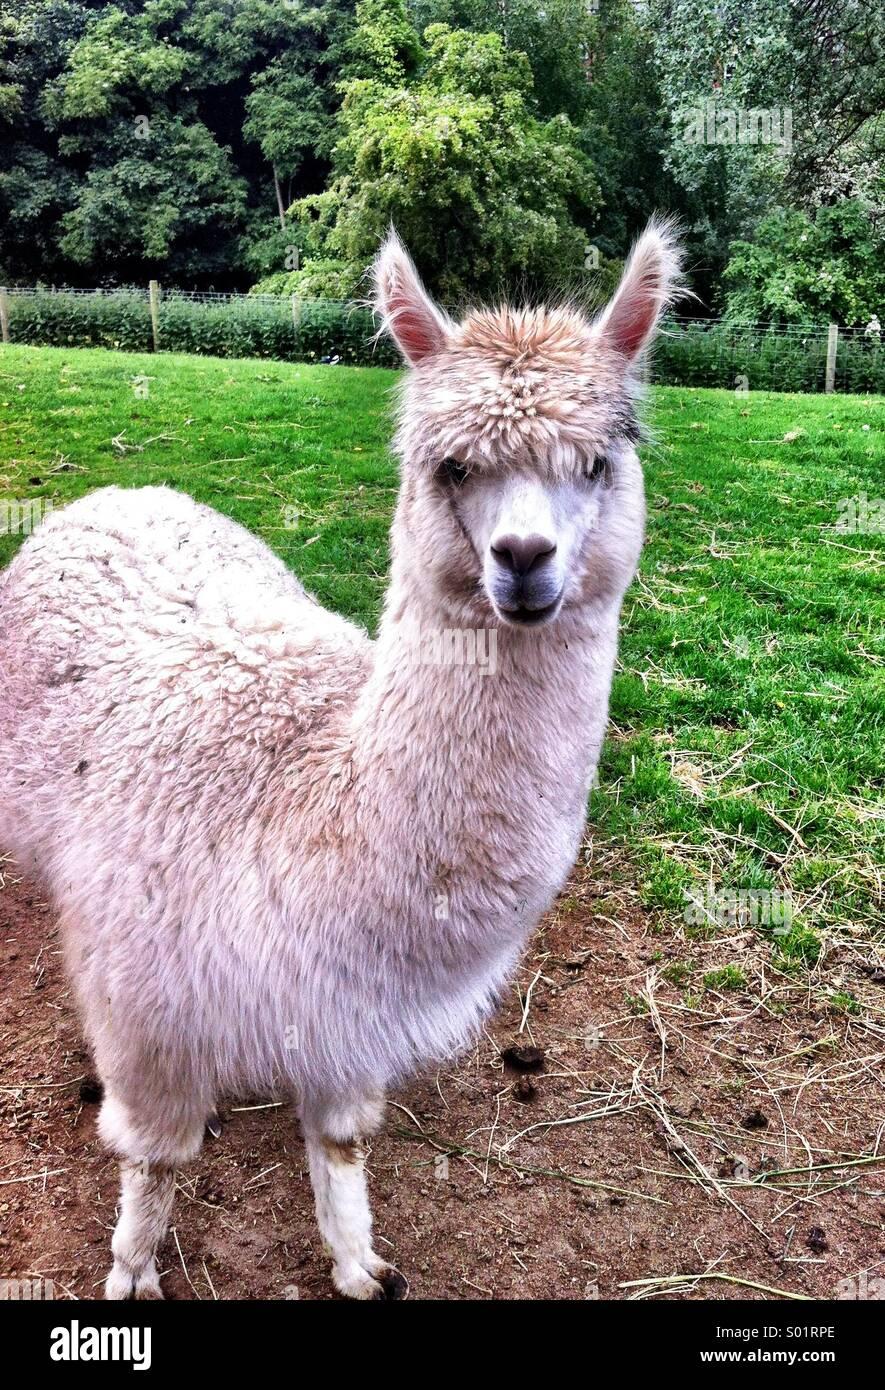 Llama dans champ vert , animal mignon Photo Stock